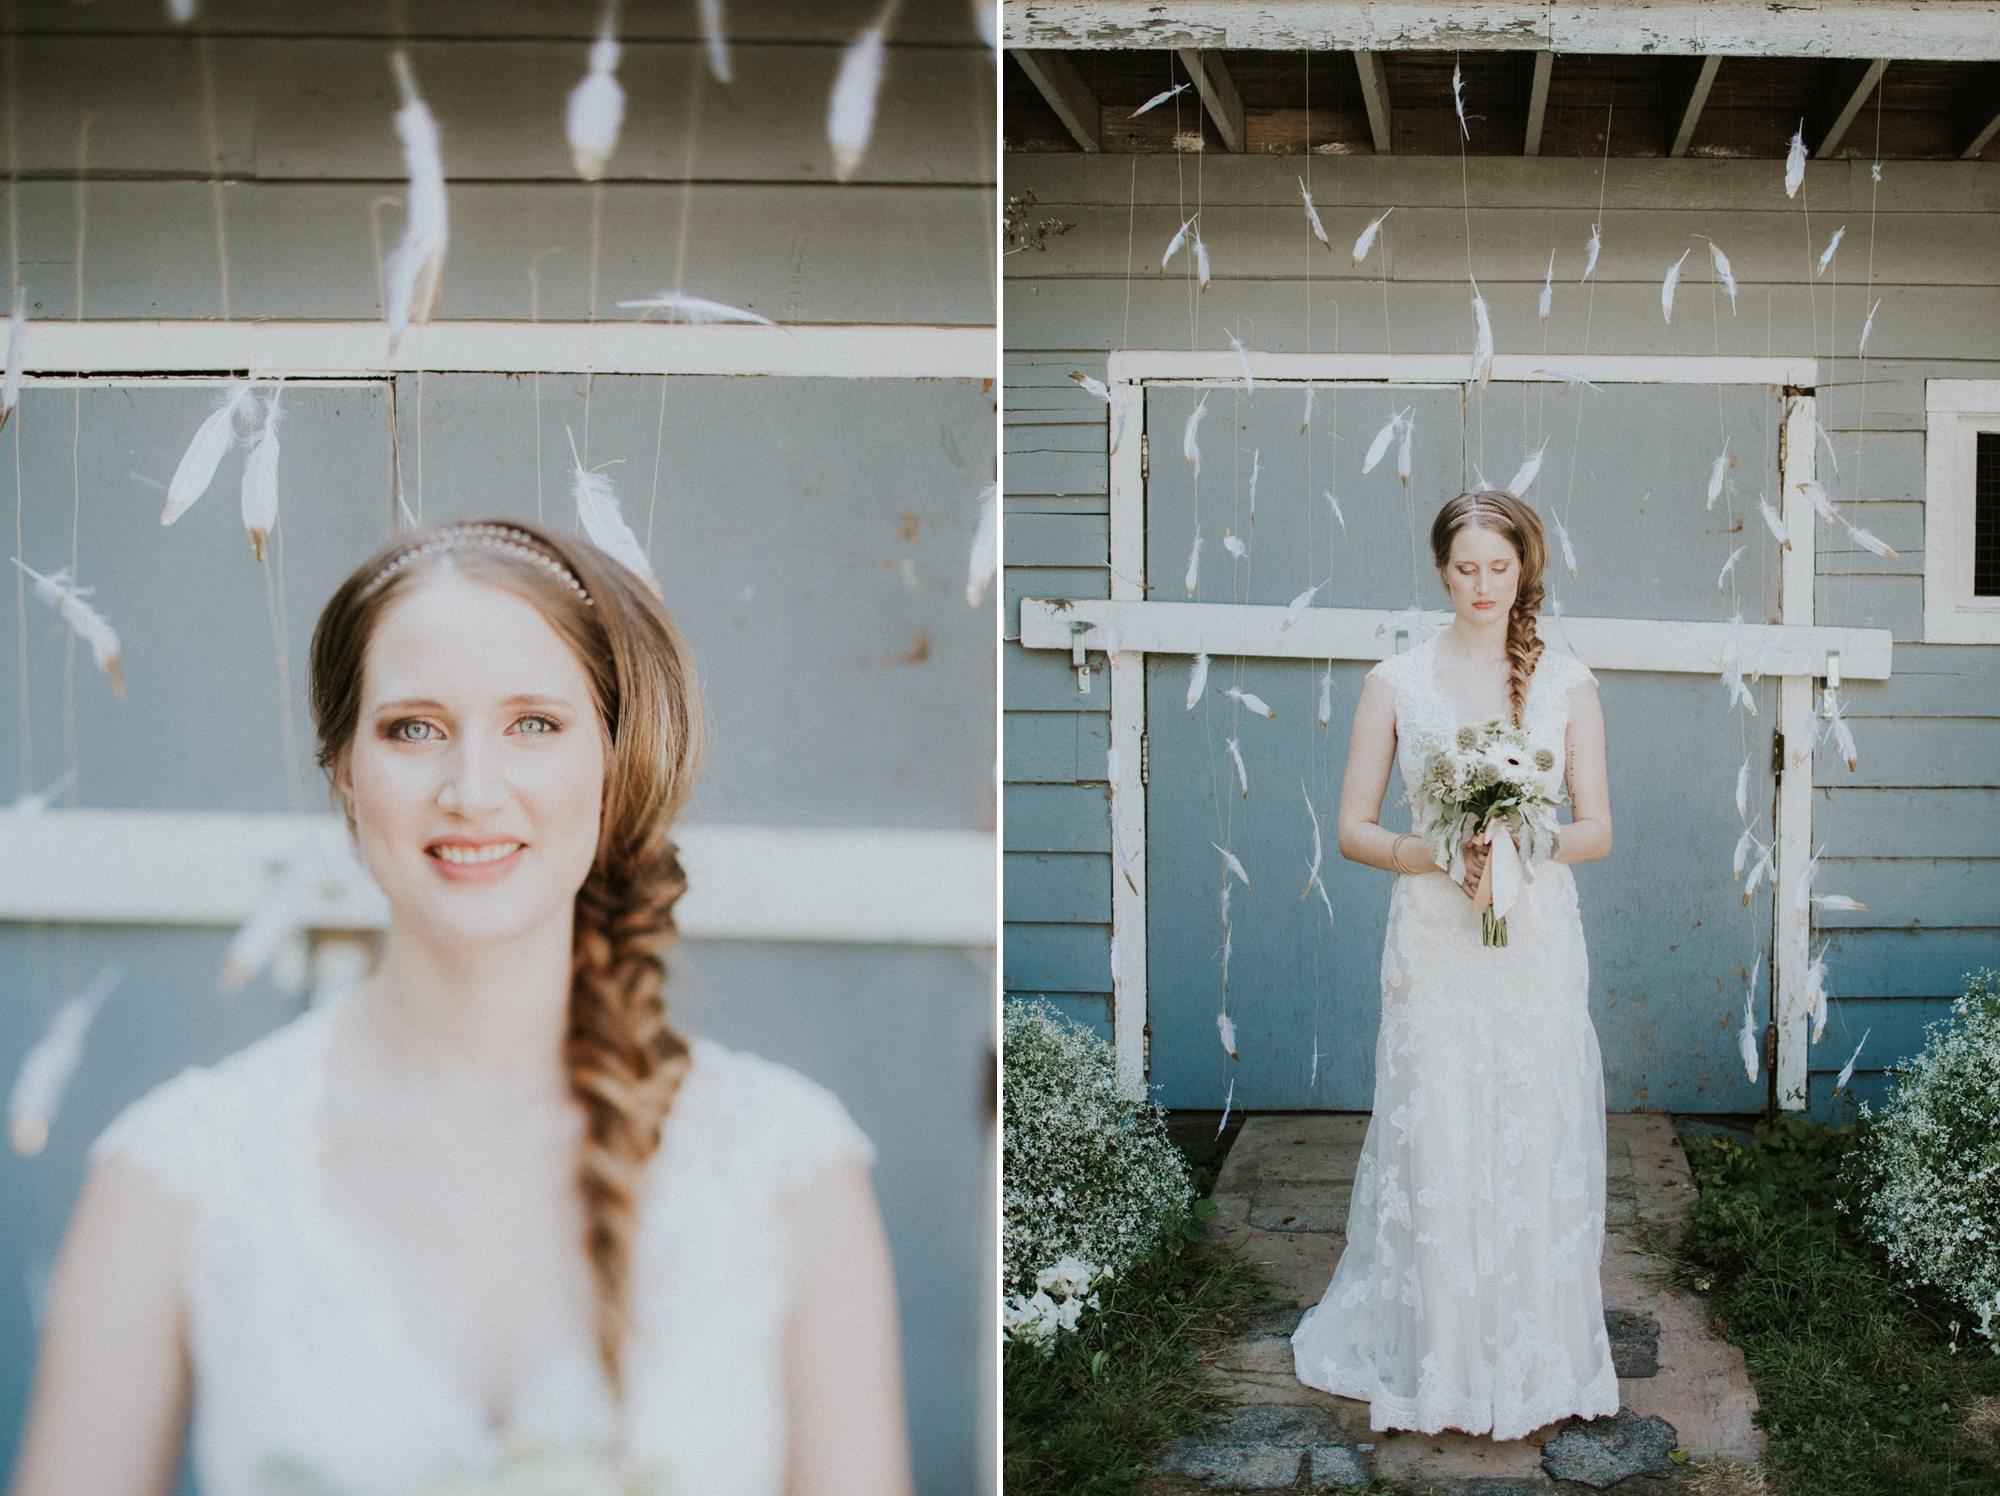 835-abbotsford-wedding-photographer